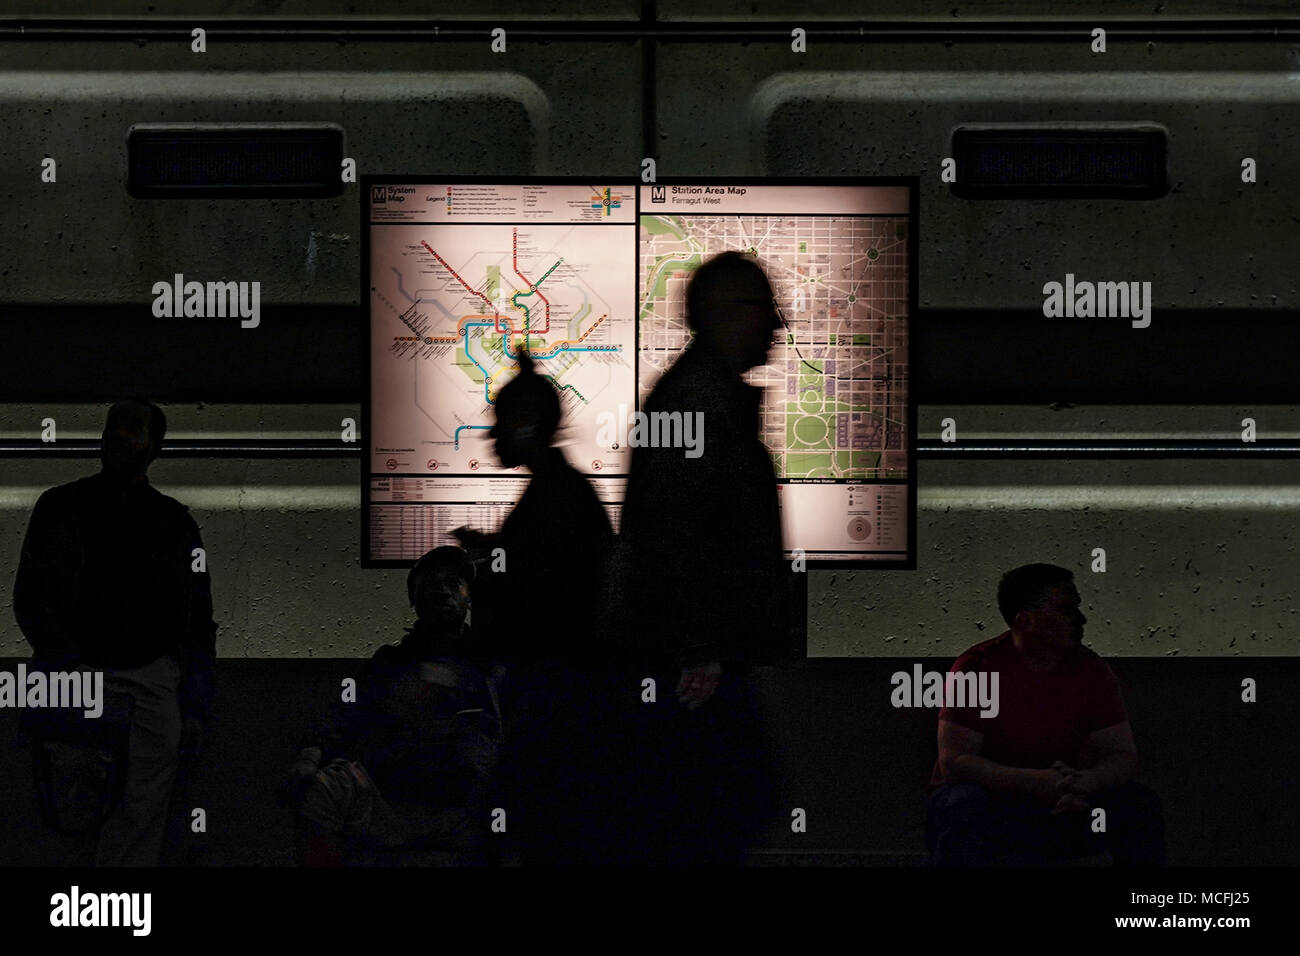 Washington State Subway Map.Washington Dc Subway Map Stock Photos Washington Dc Subway Map